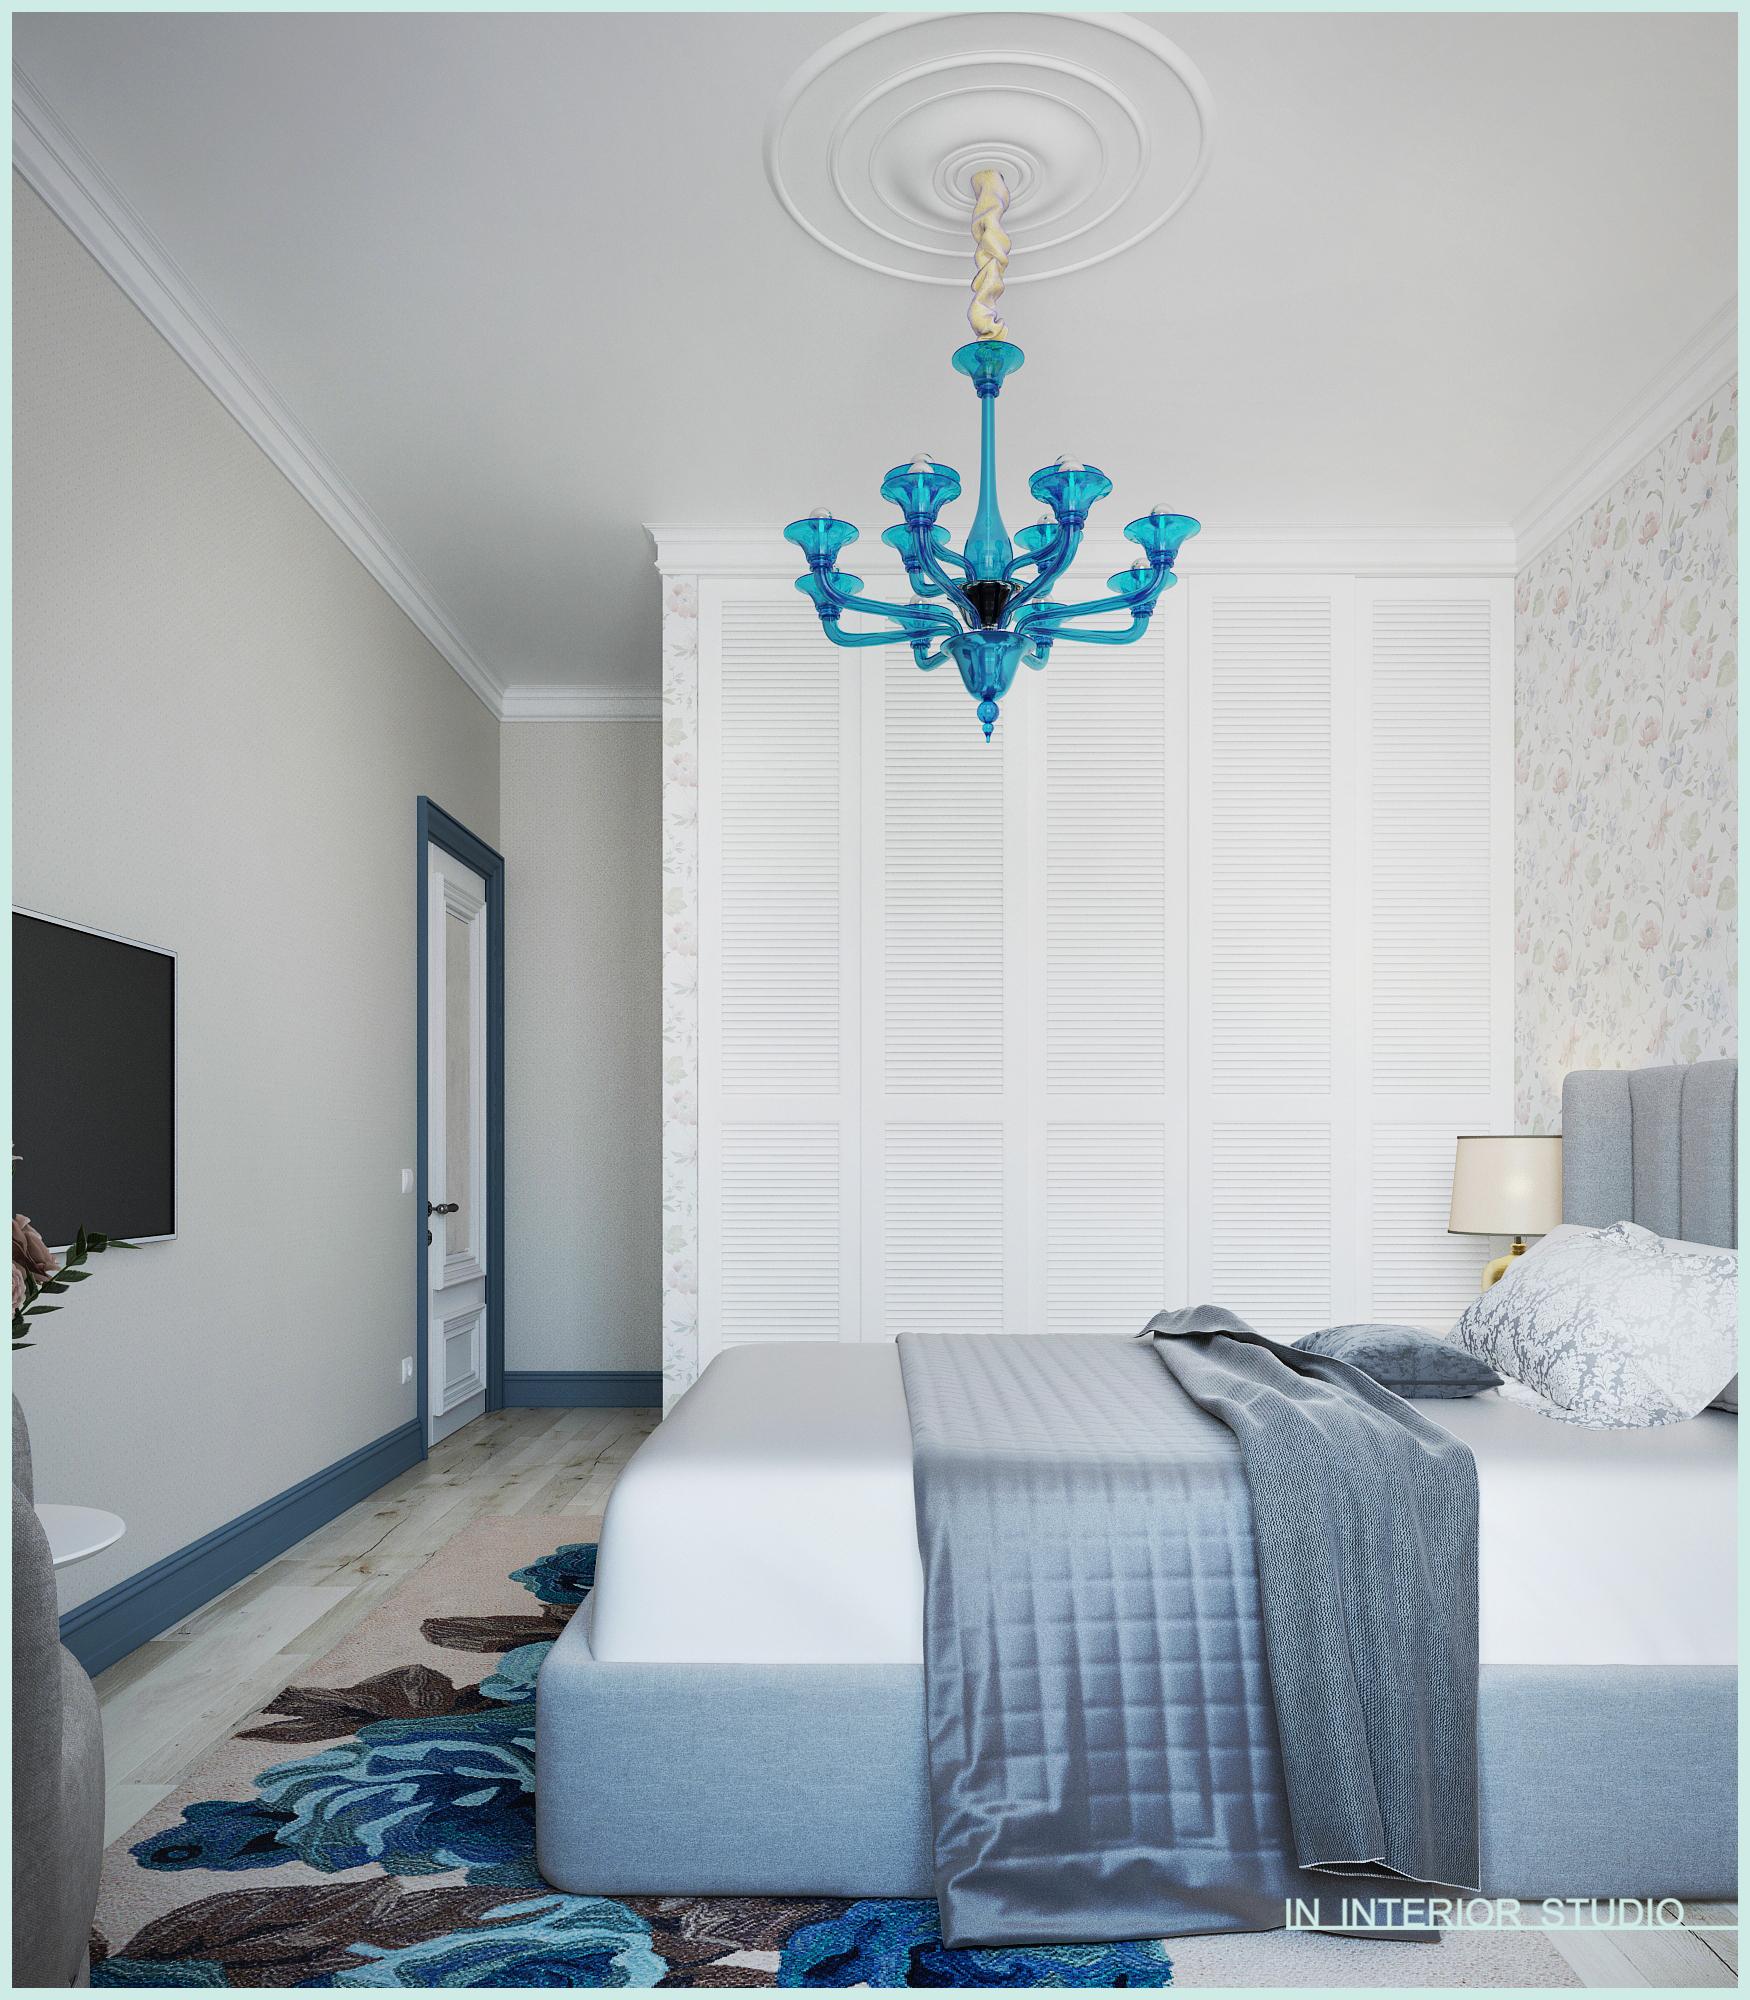 Интересная спальная комната с акцентами